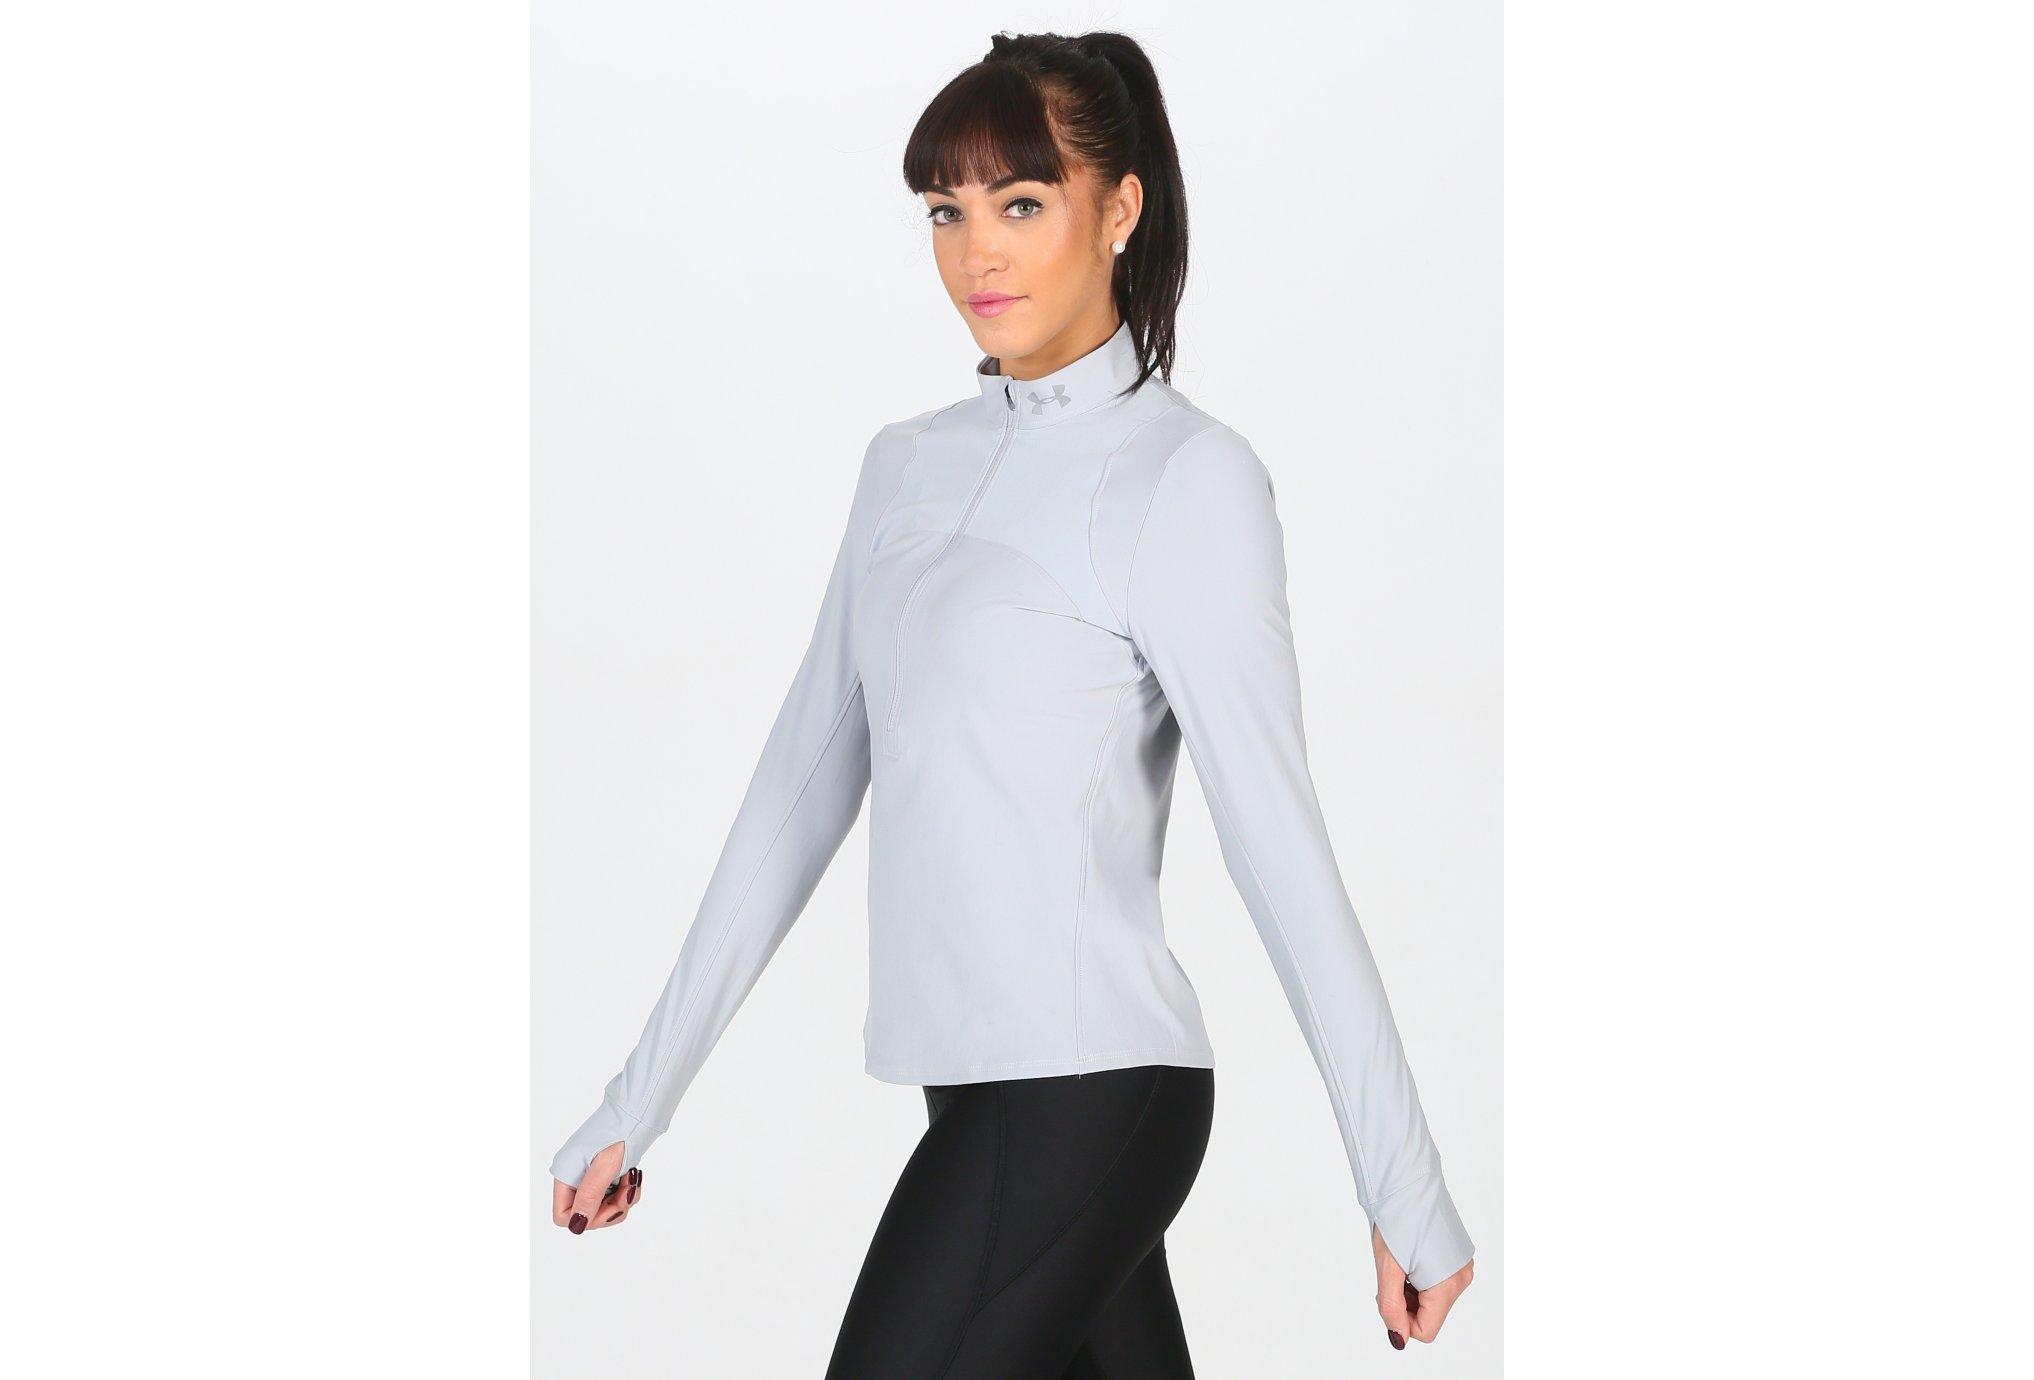 Under Armour Qualifer 1/2 Zip W vêtement running femme